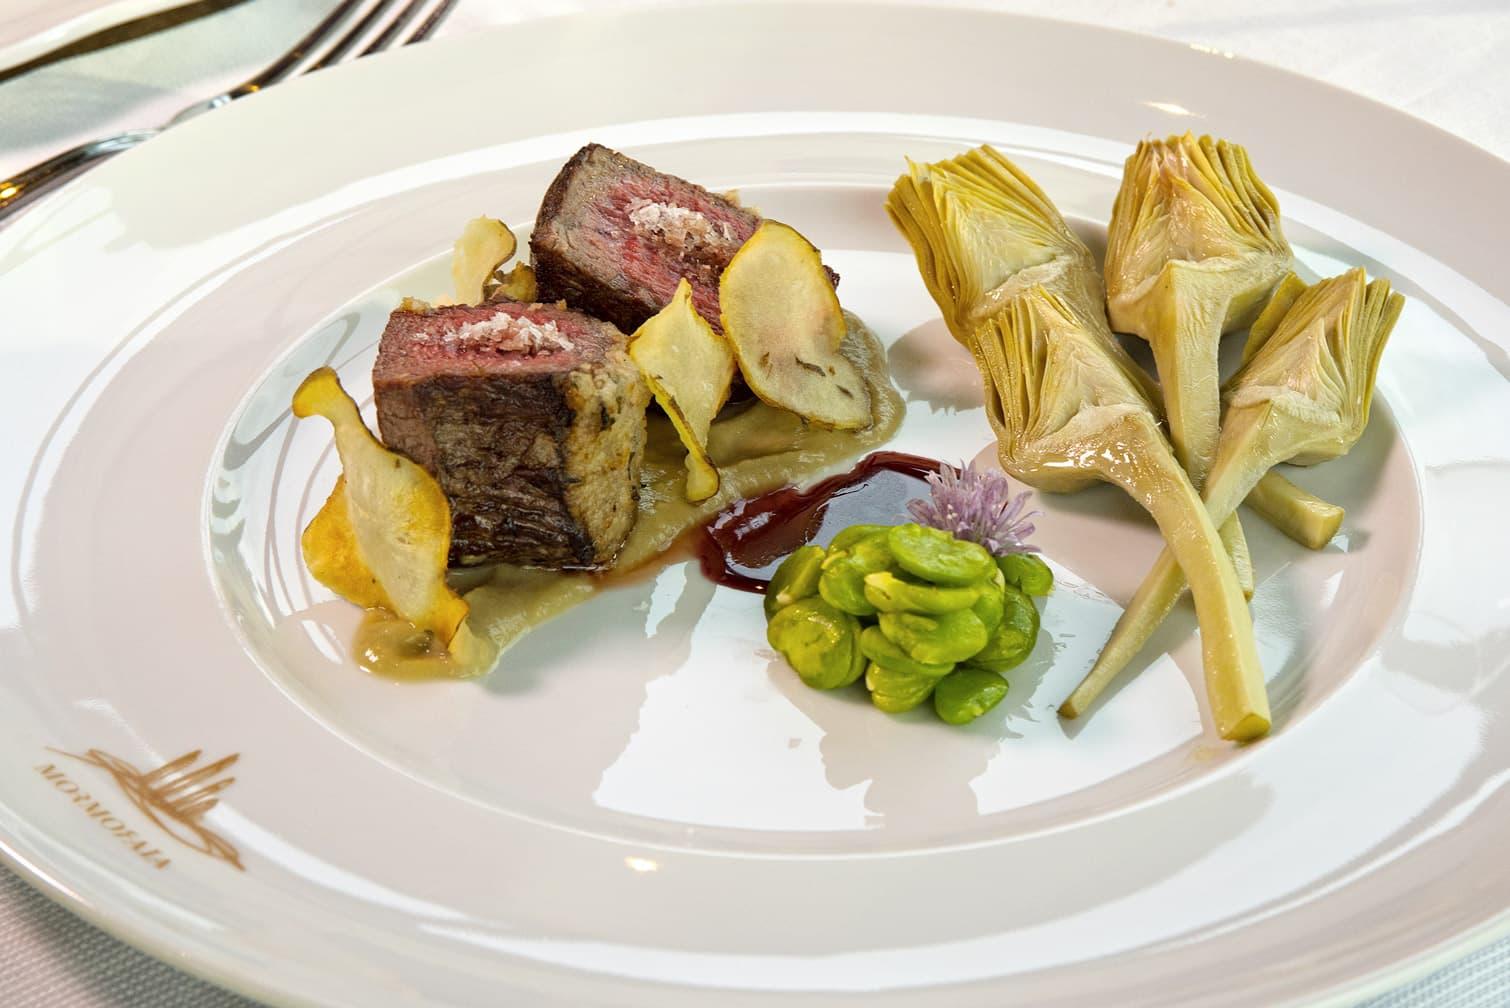 gallery-mormoraia-san-gimignano-agriturismo-gastronomia-rustico-4613.jpg